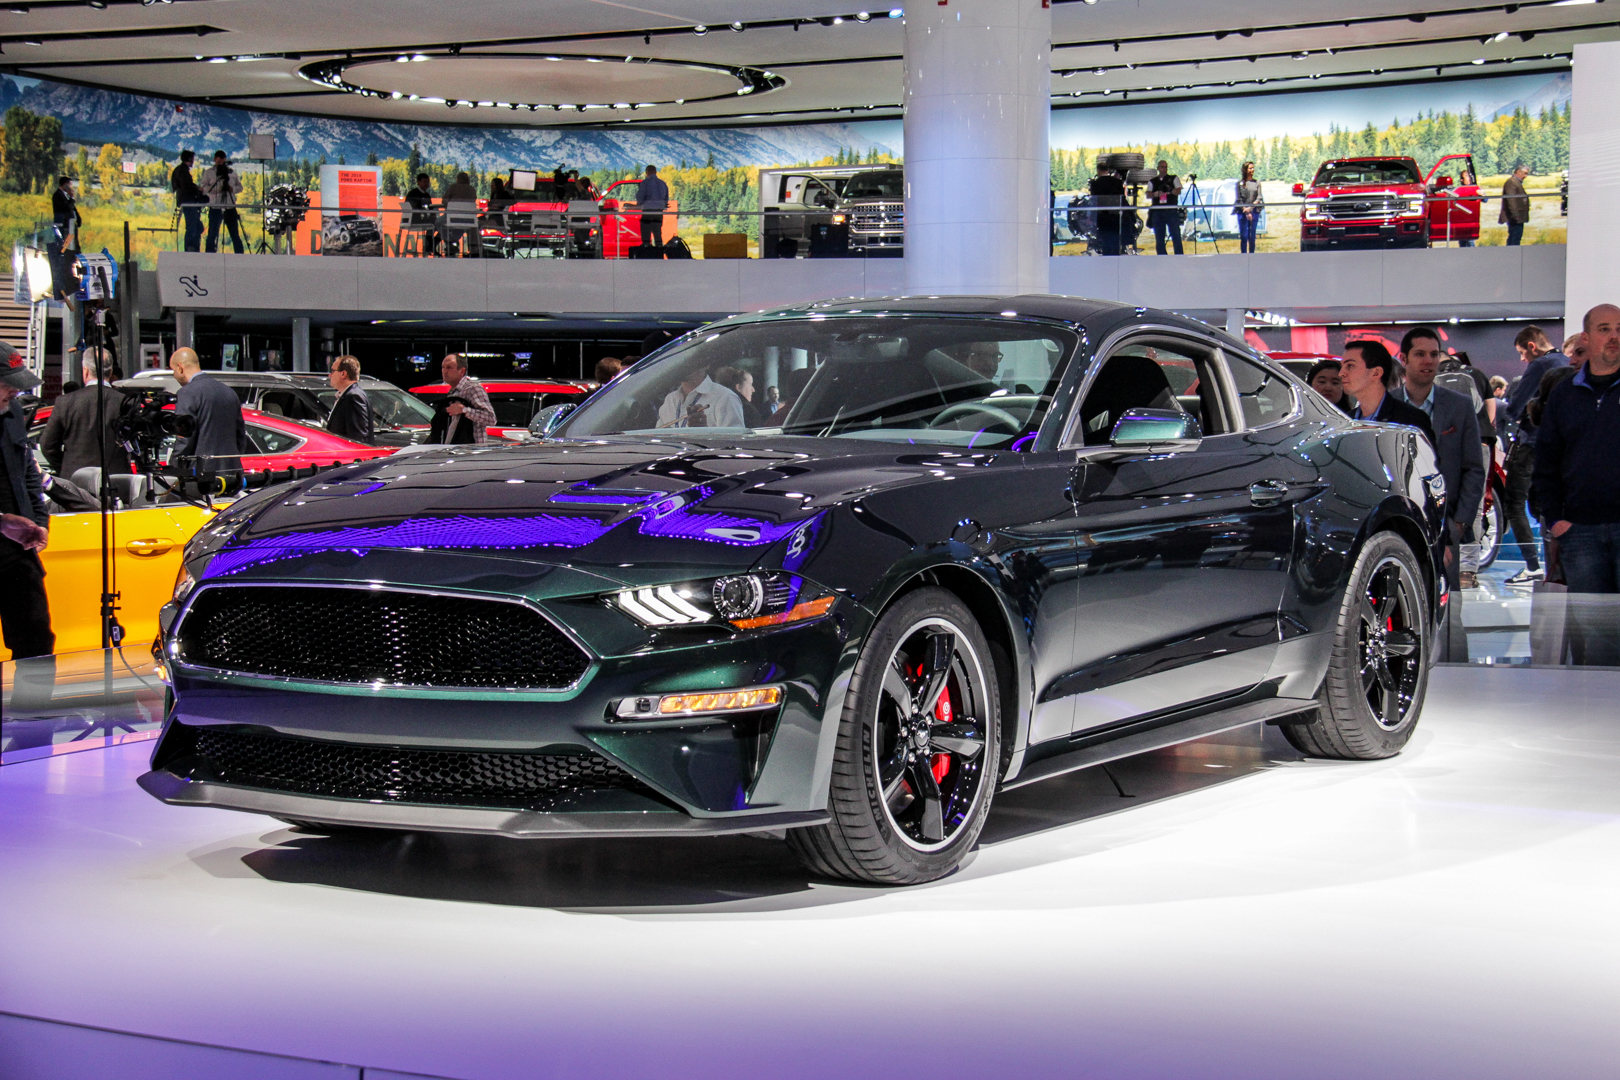 2018 Detroit Auto Show Ford Mustang Bullitt